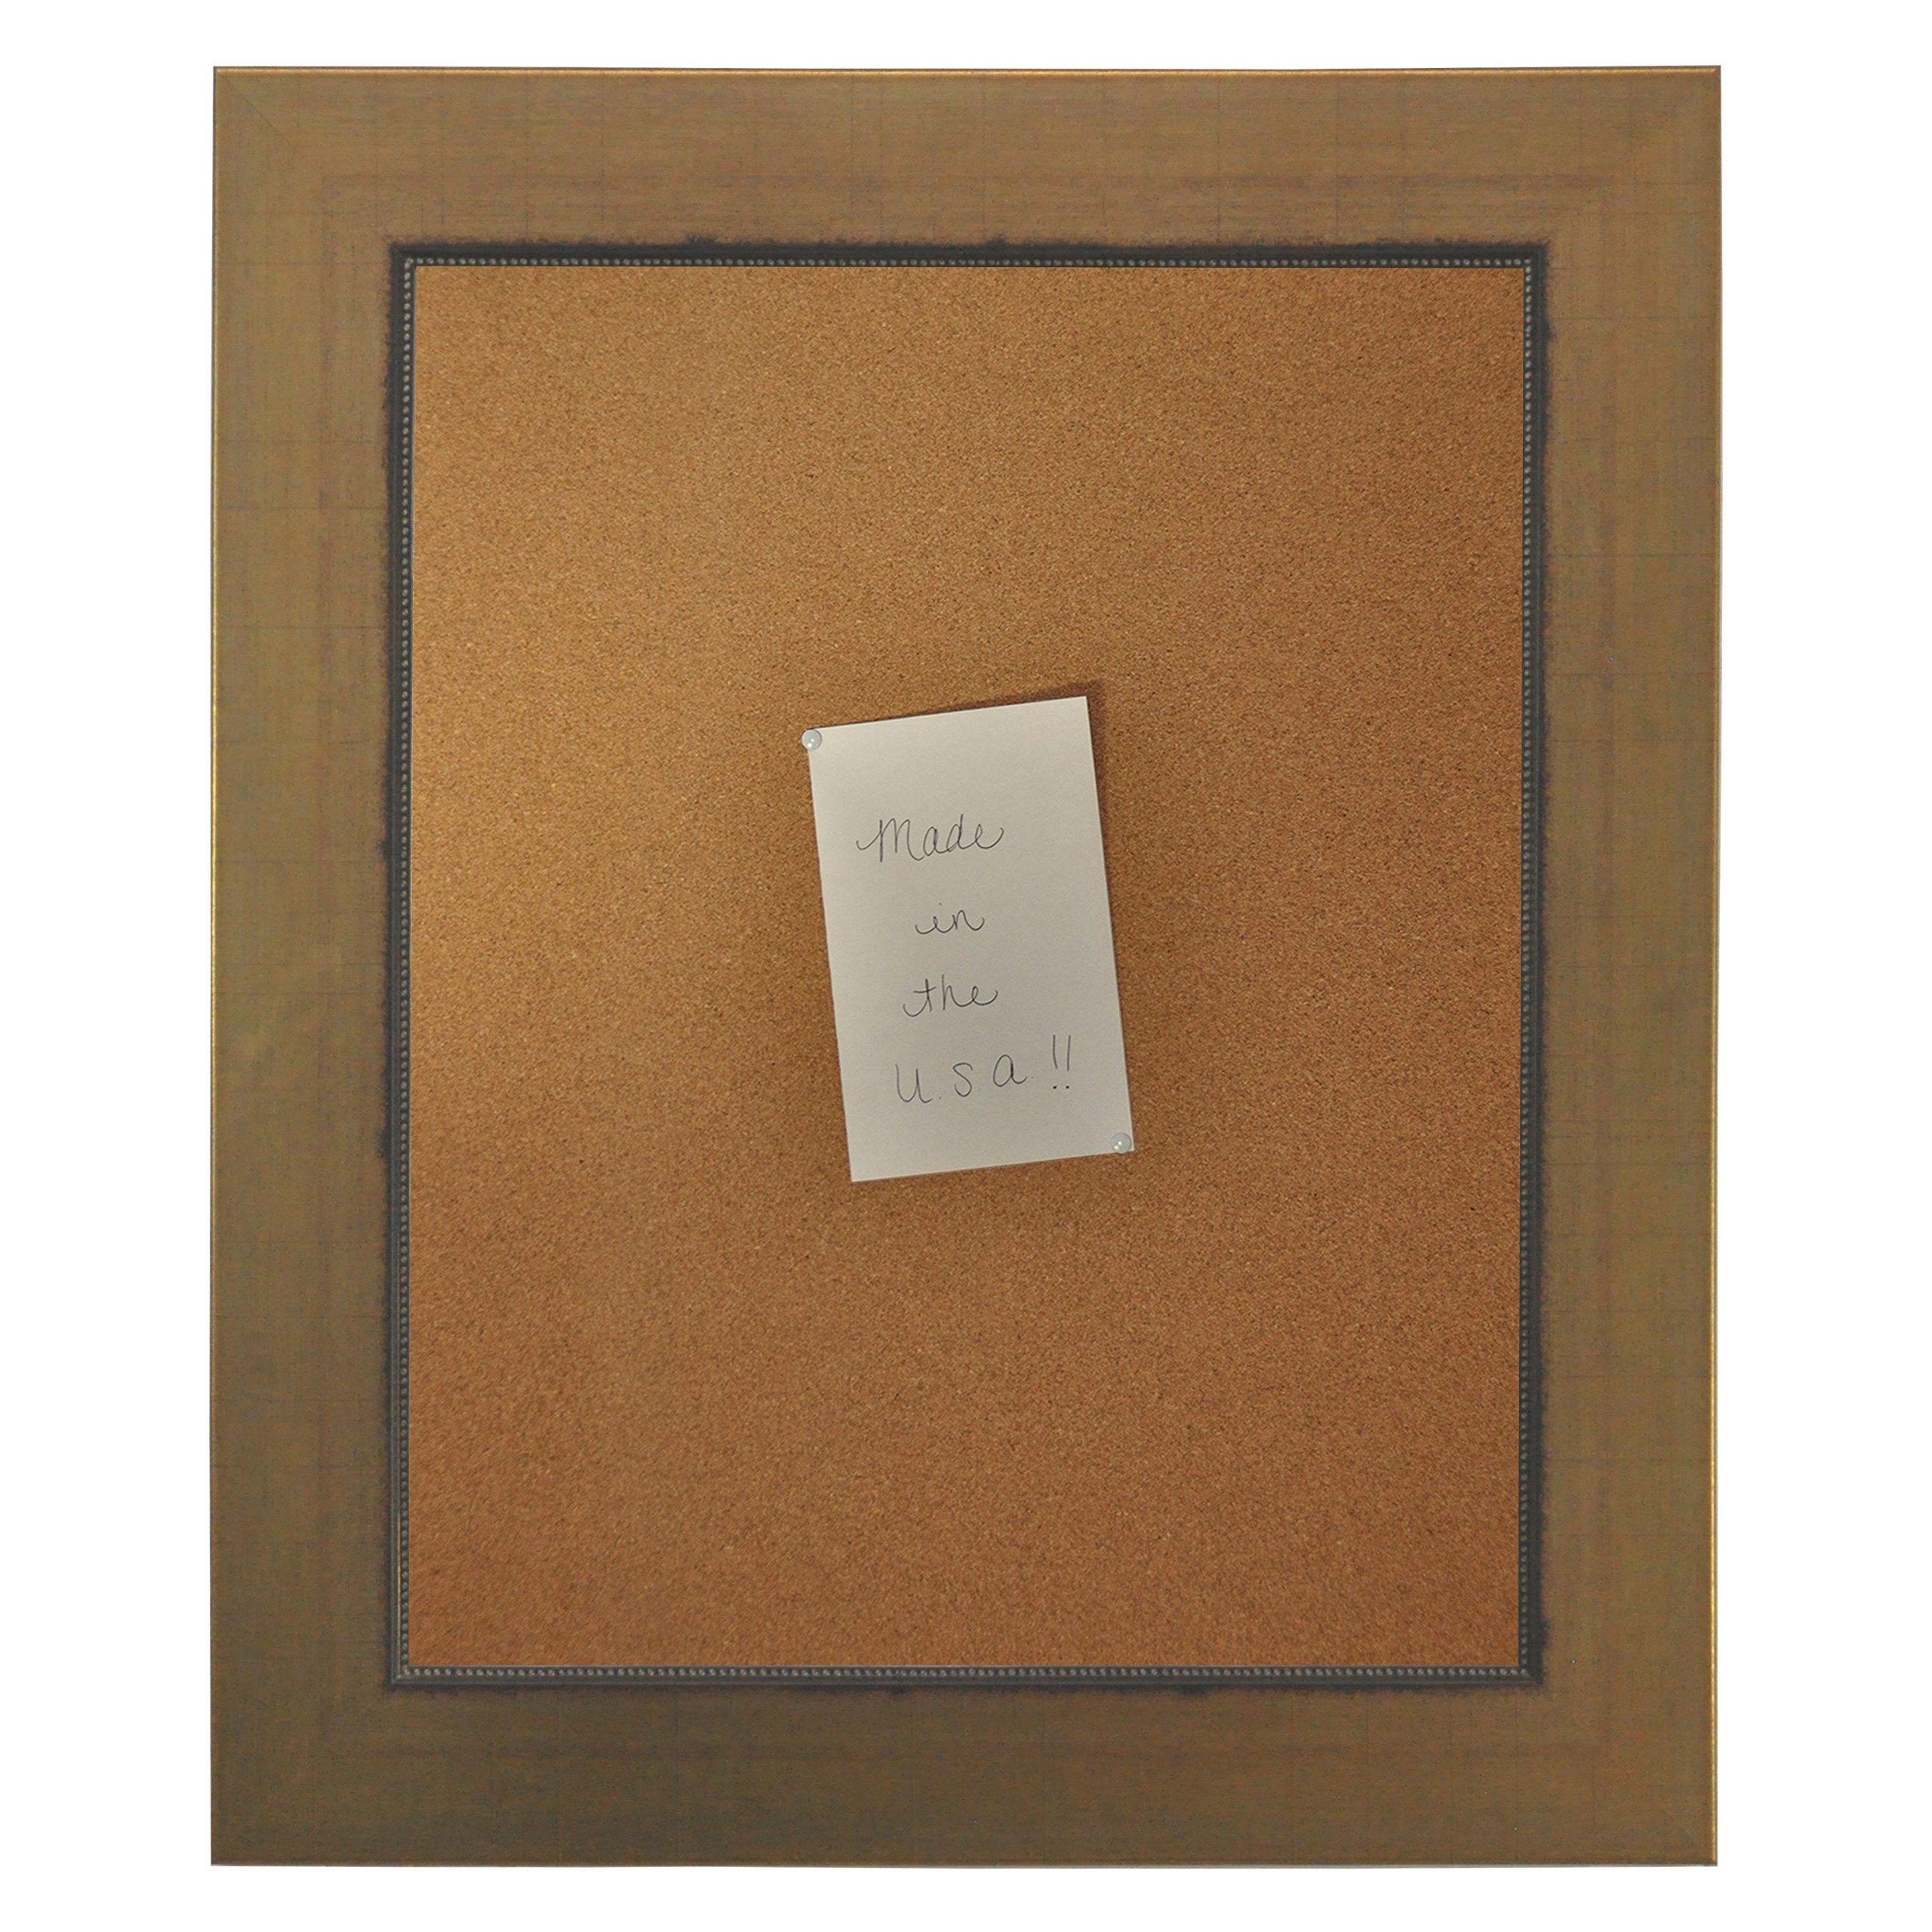 Rayne Mirrors American Made Rayne Golden Lowe Corkboard Exterior Size: 17 x 29